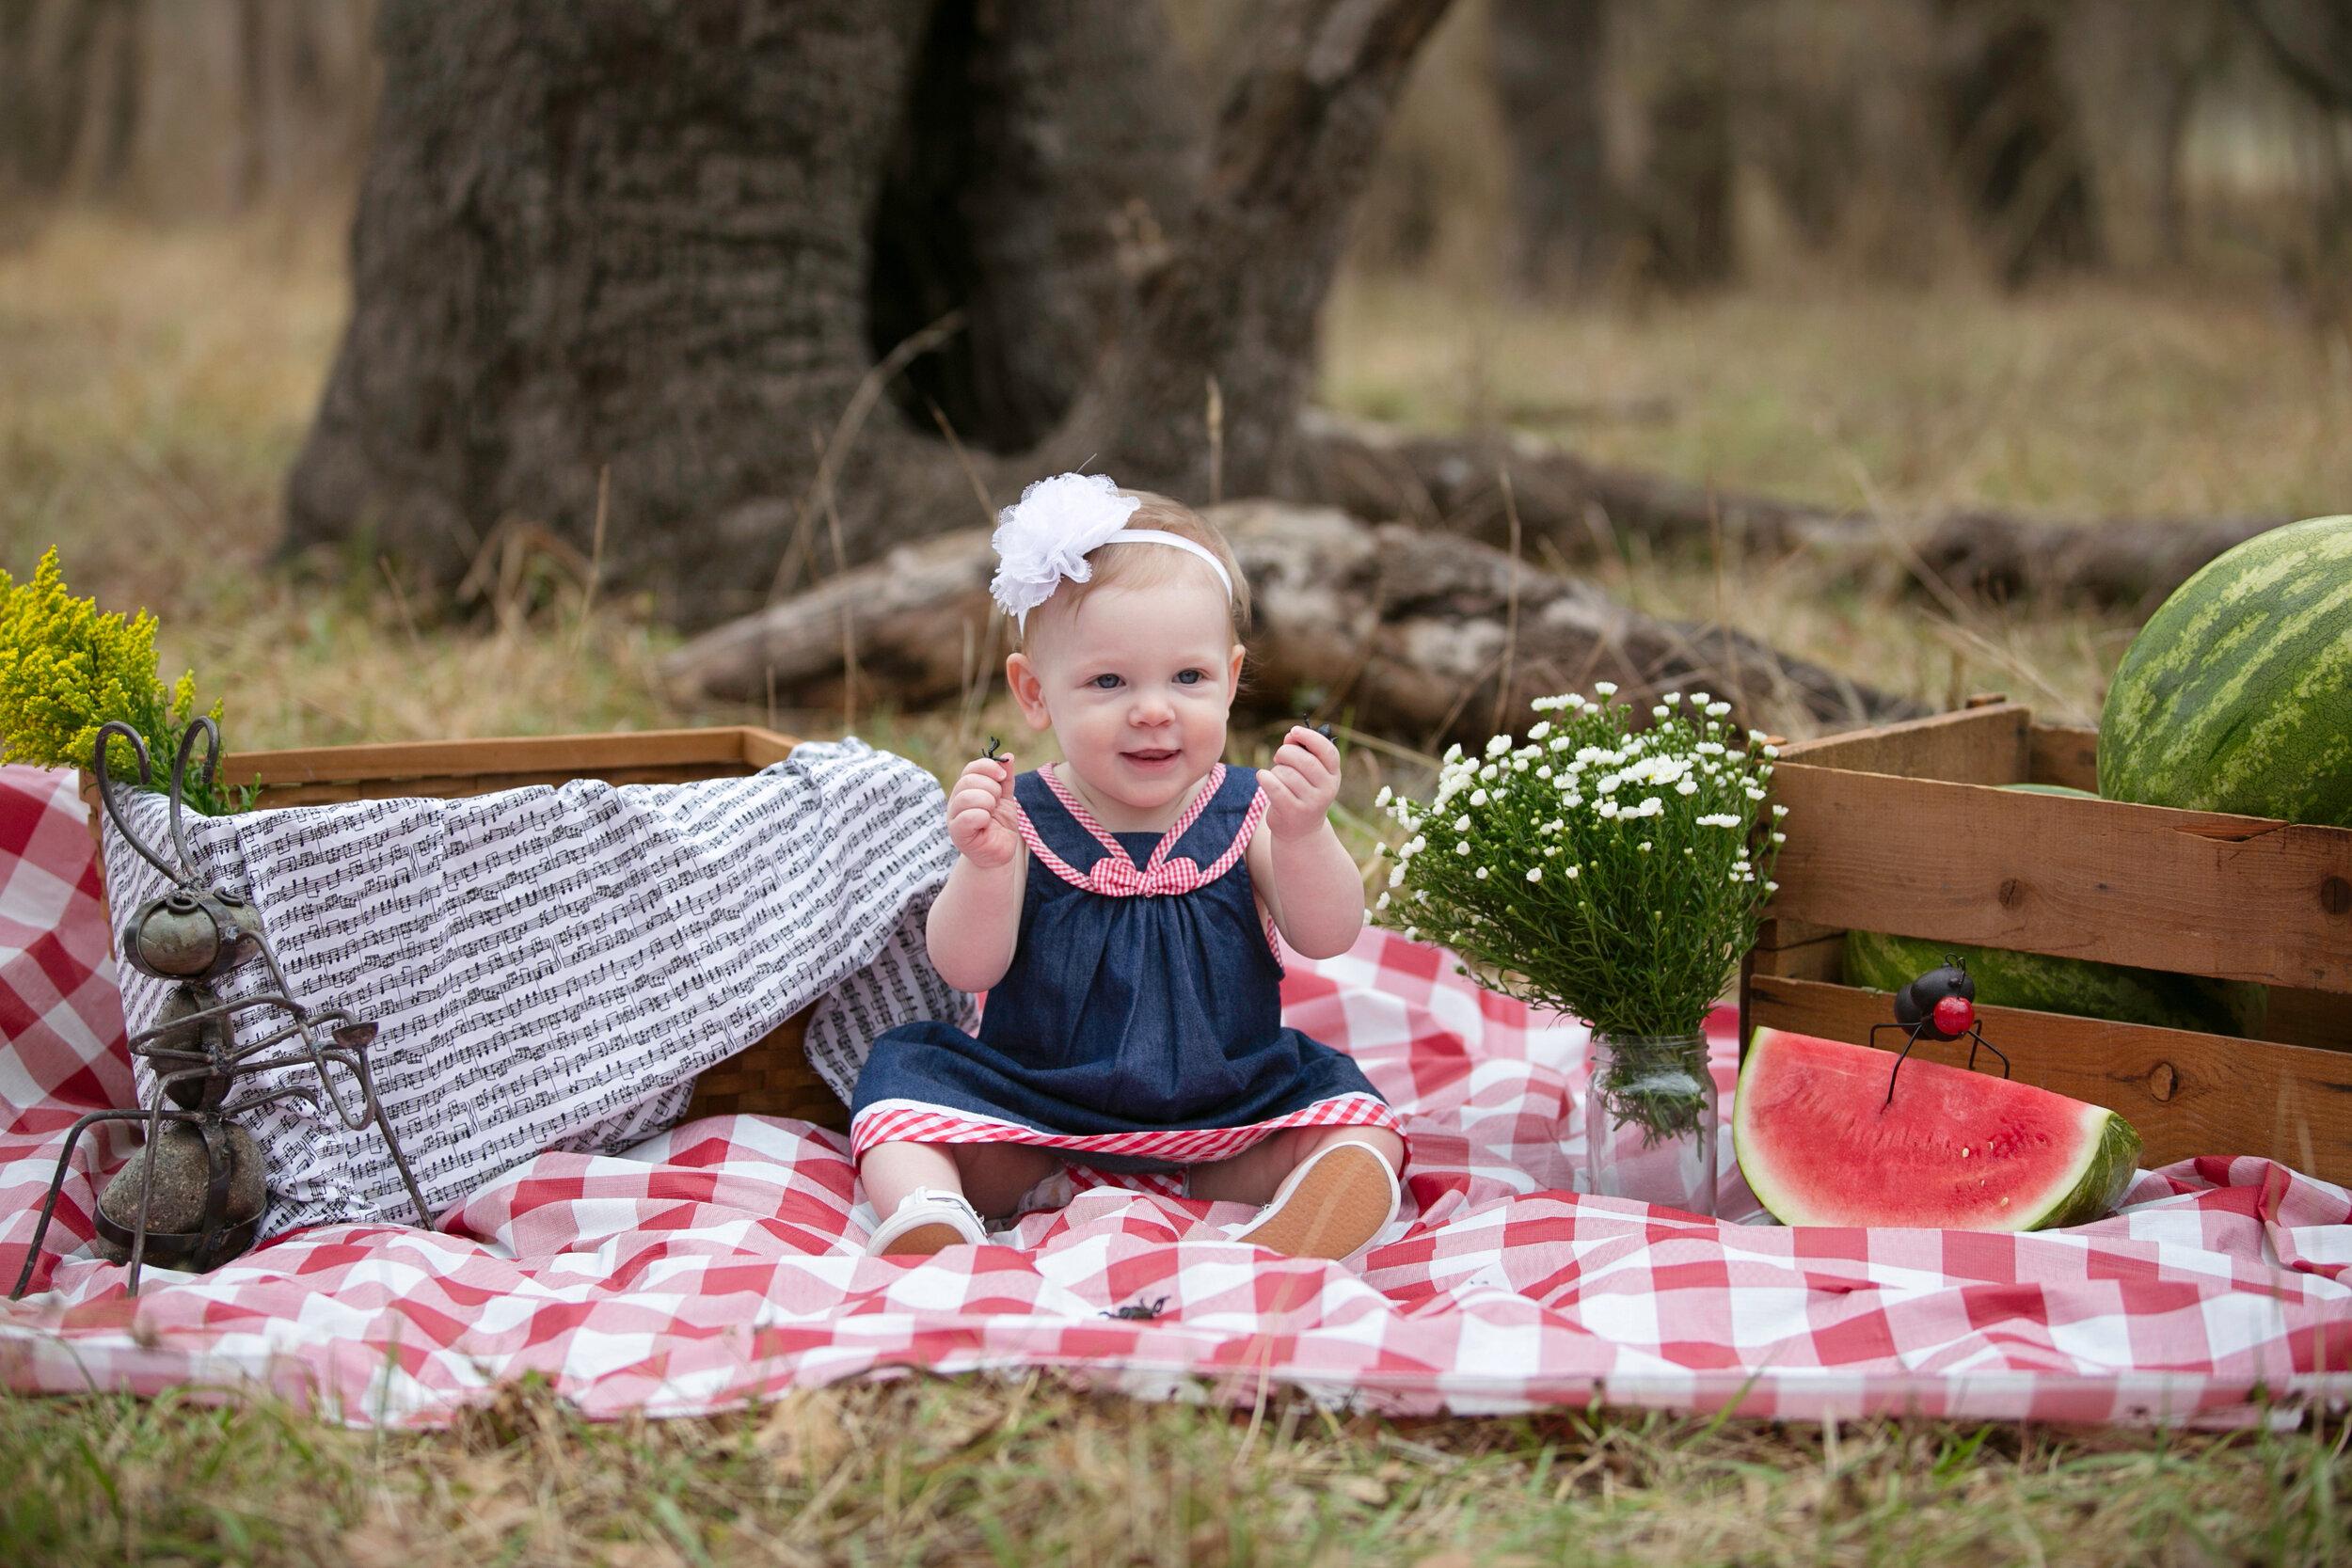 watermelon-summer-picnic-cake-smash-lytle-san-antonio-texas-photographer-4.jpg